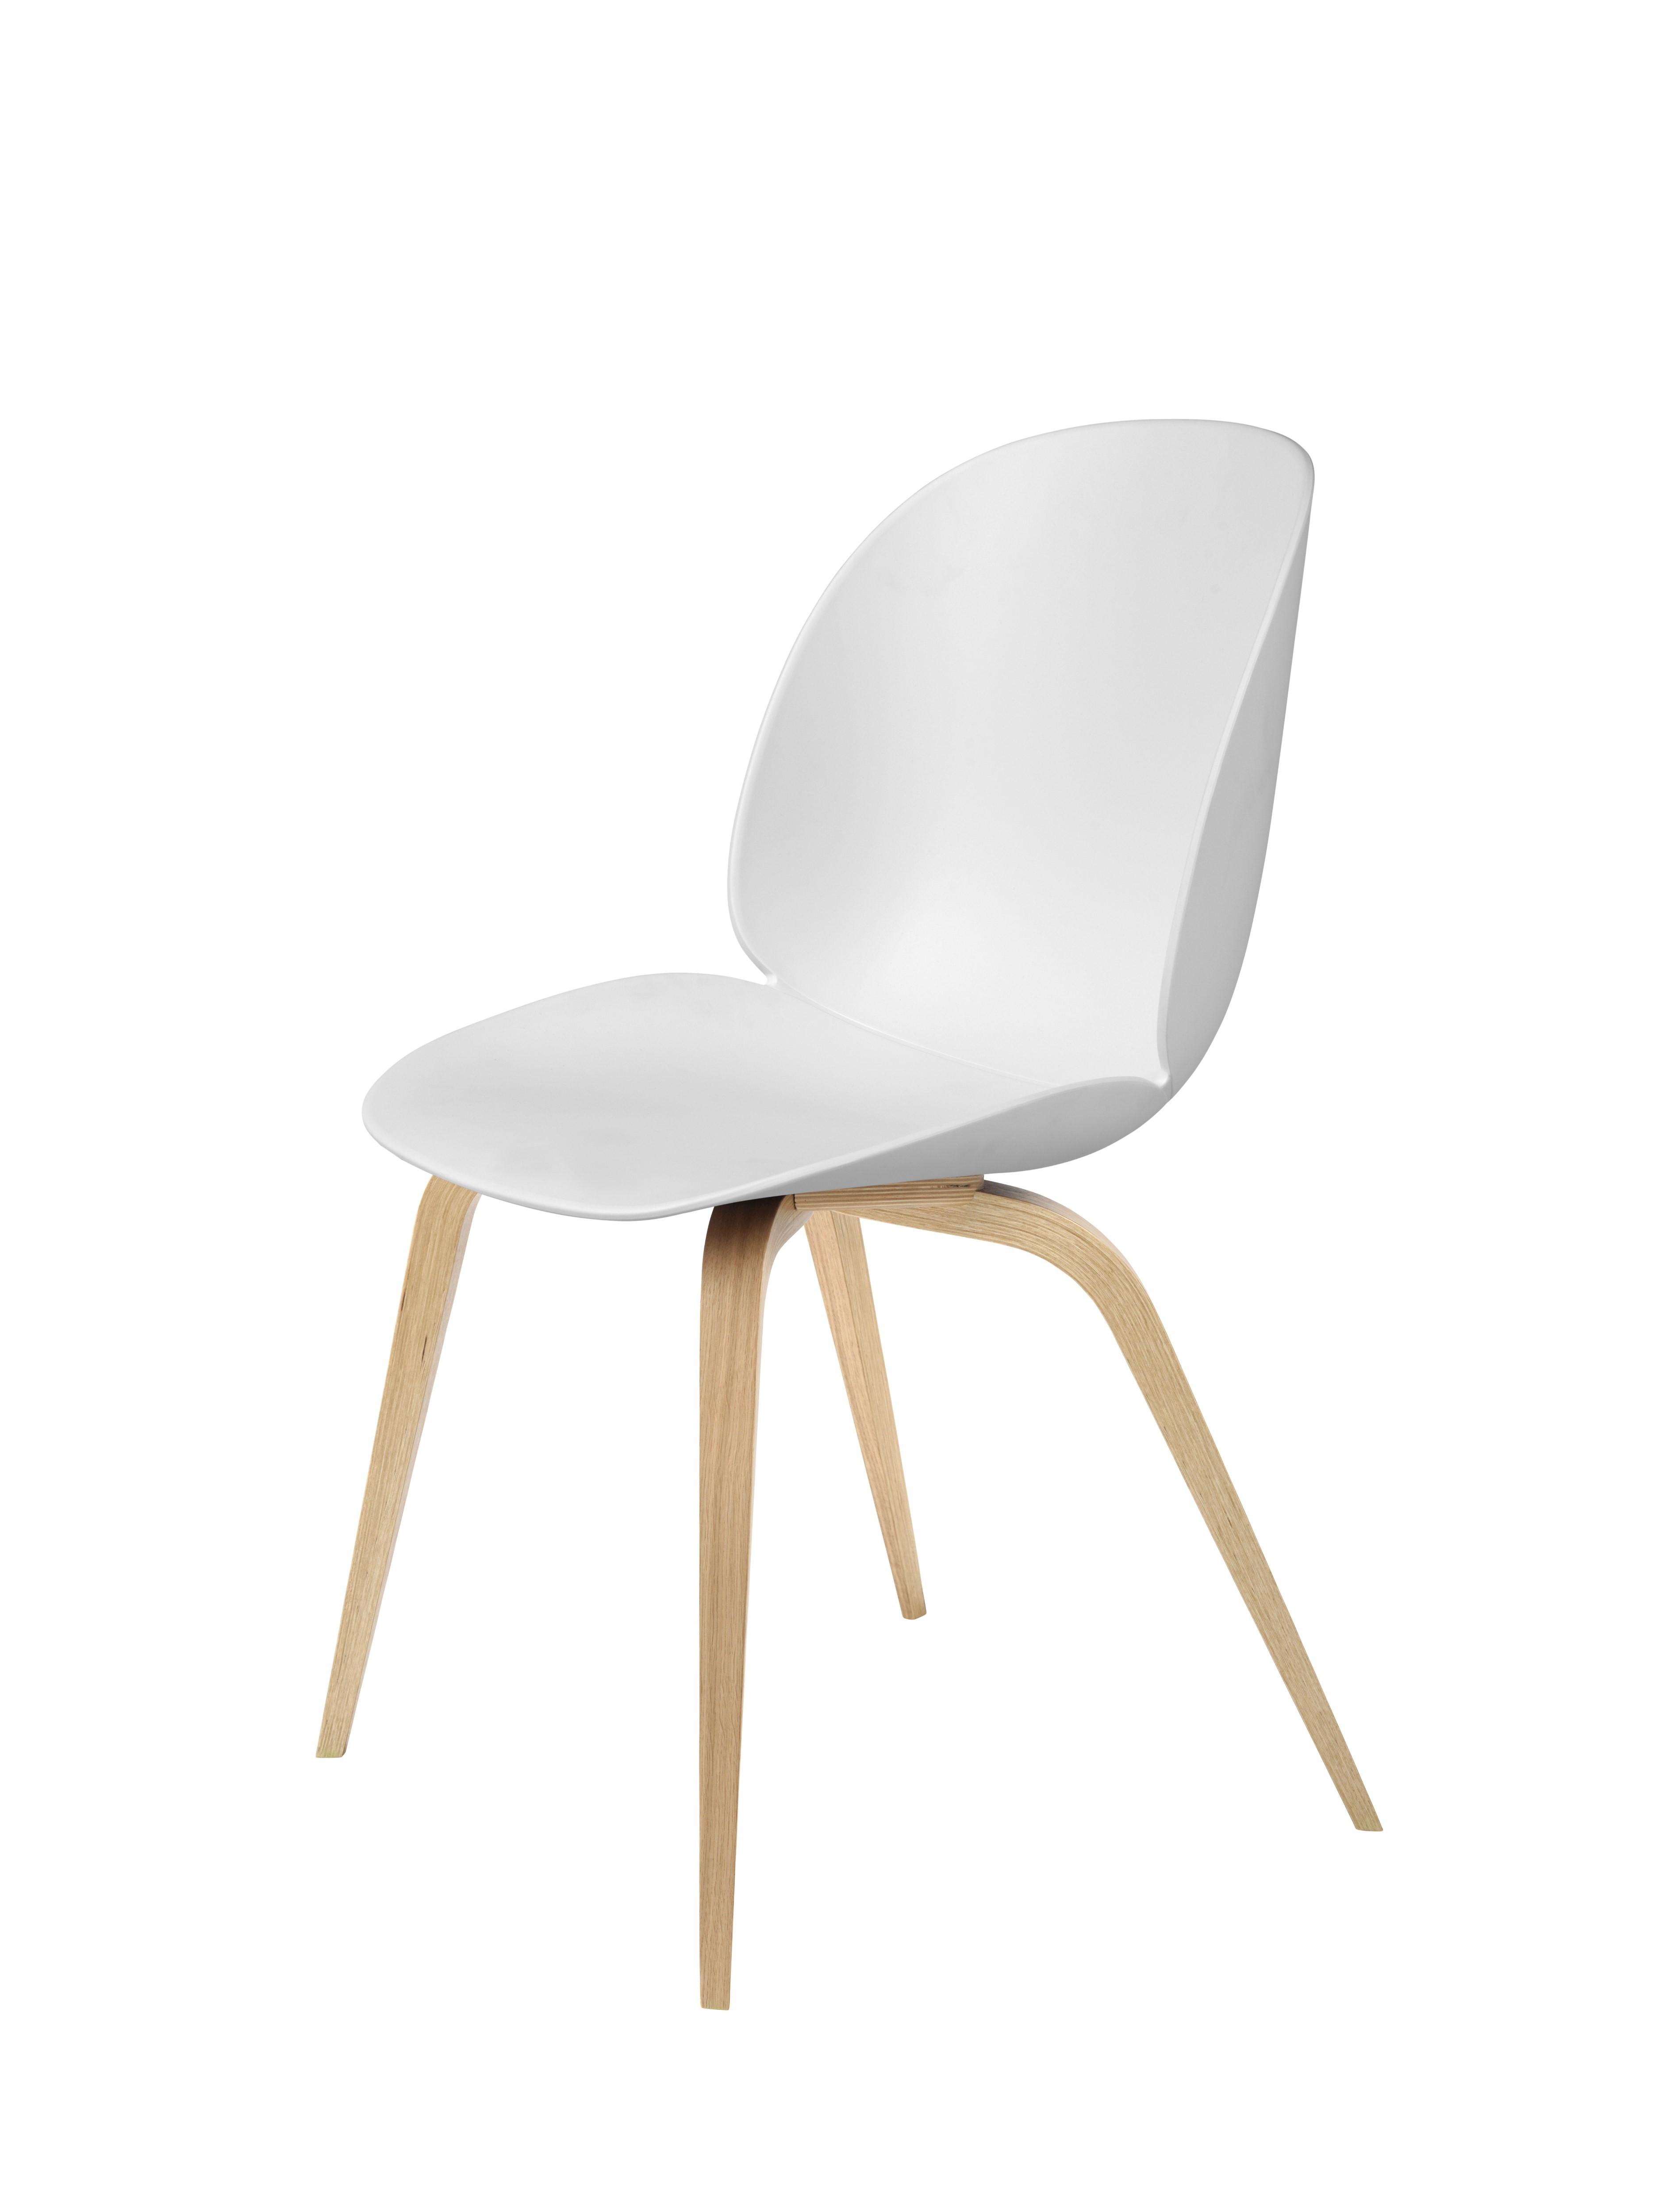 Chaise BEETLE unupholstered Wood base de Gubi, Pieds Chêne, Blanc